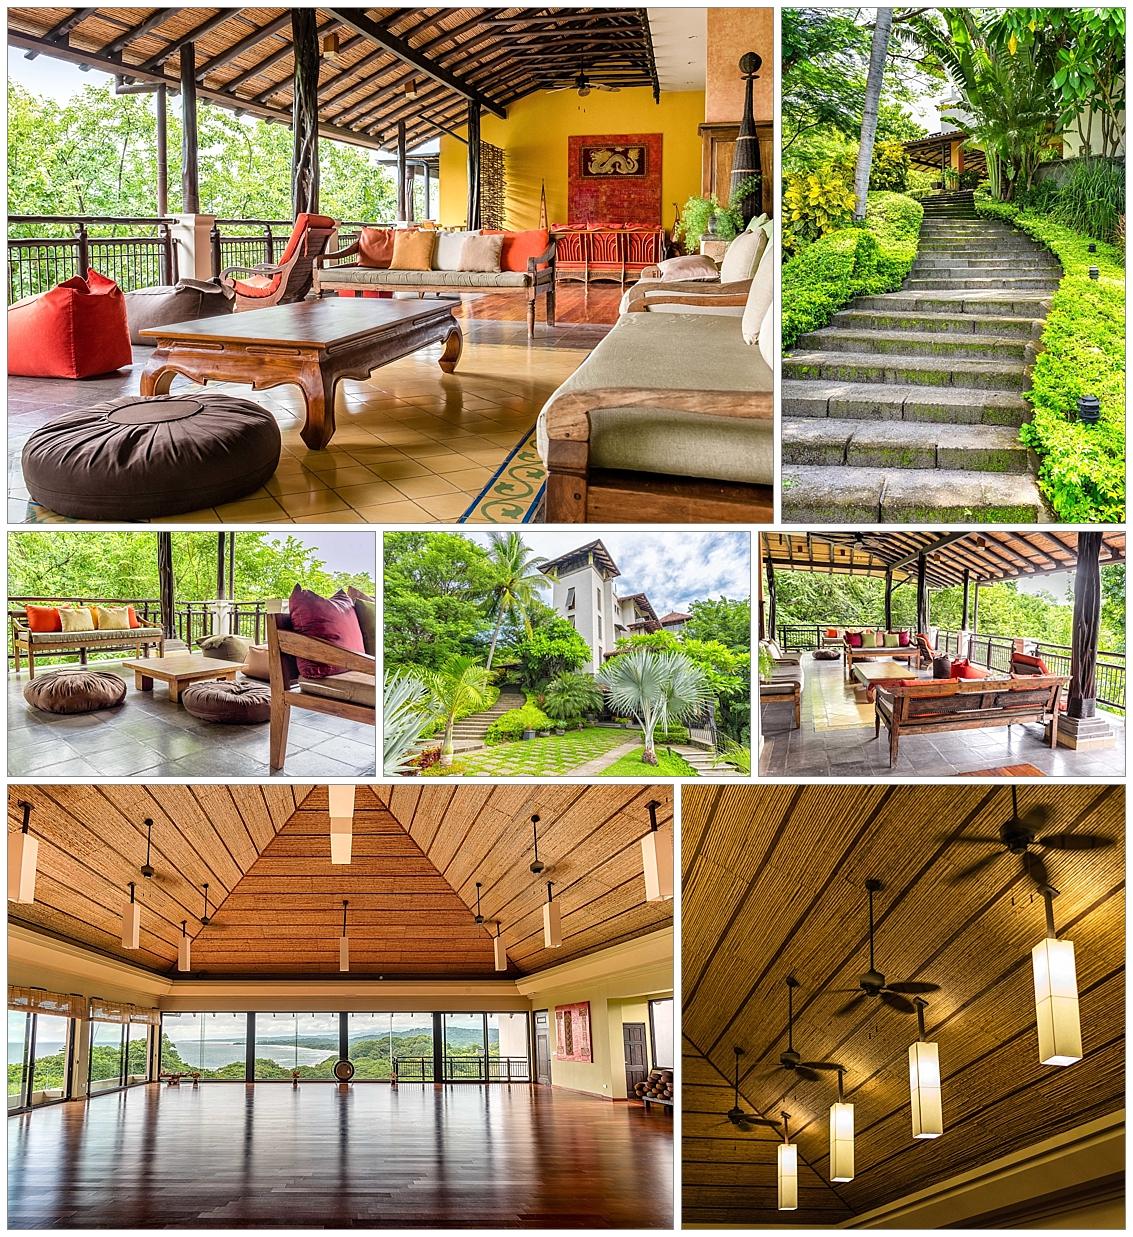 The Blue Spirit Retreat Center in Nosara, Costa Rica